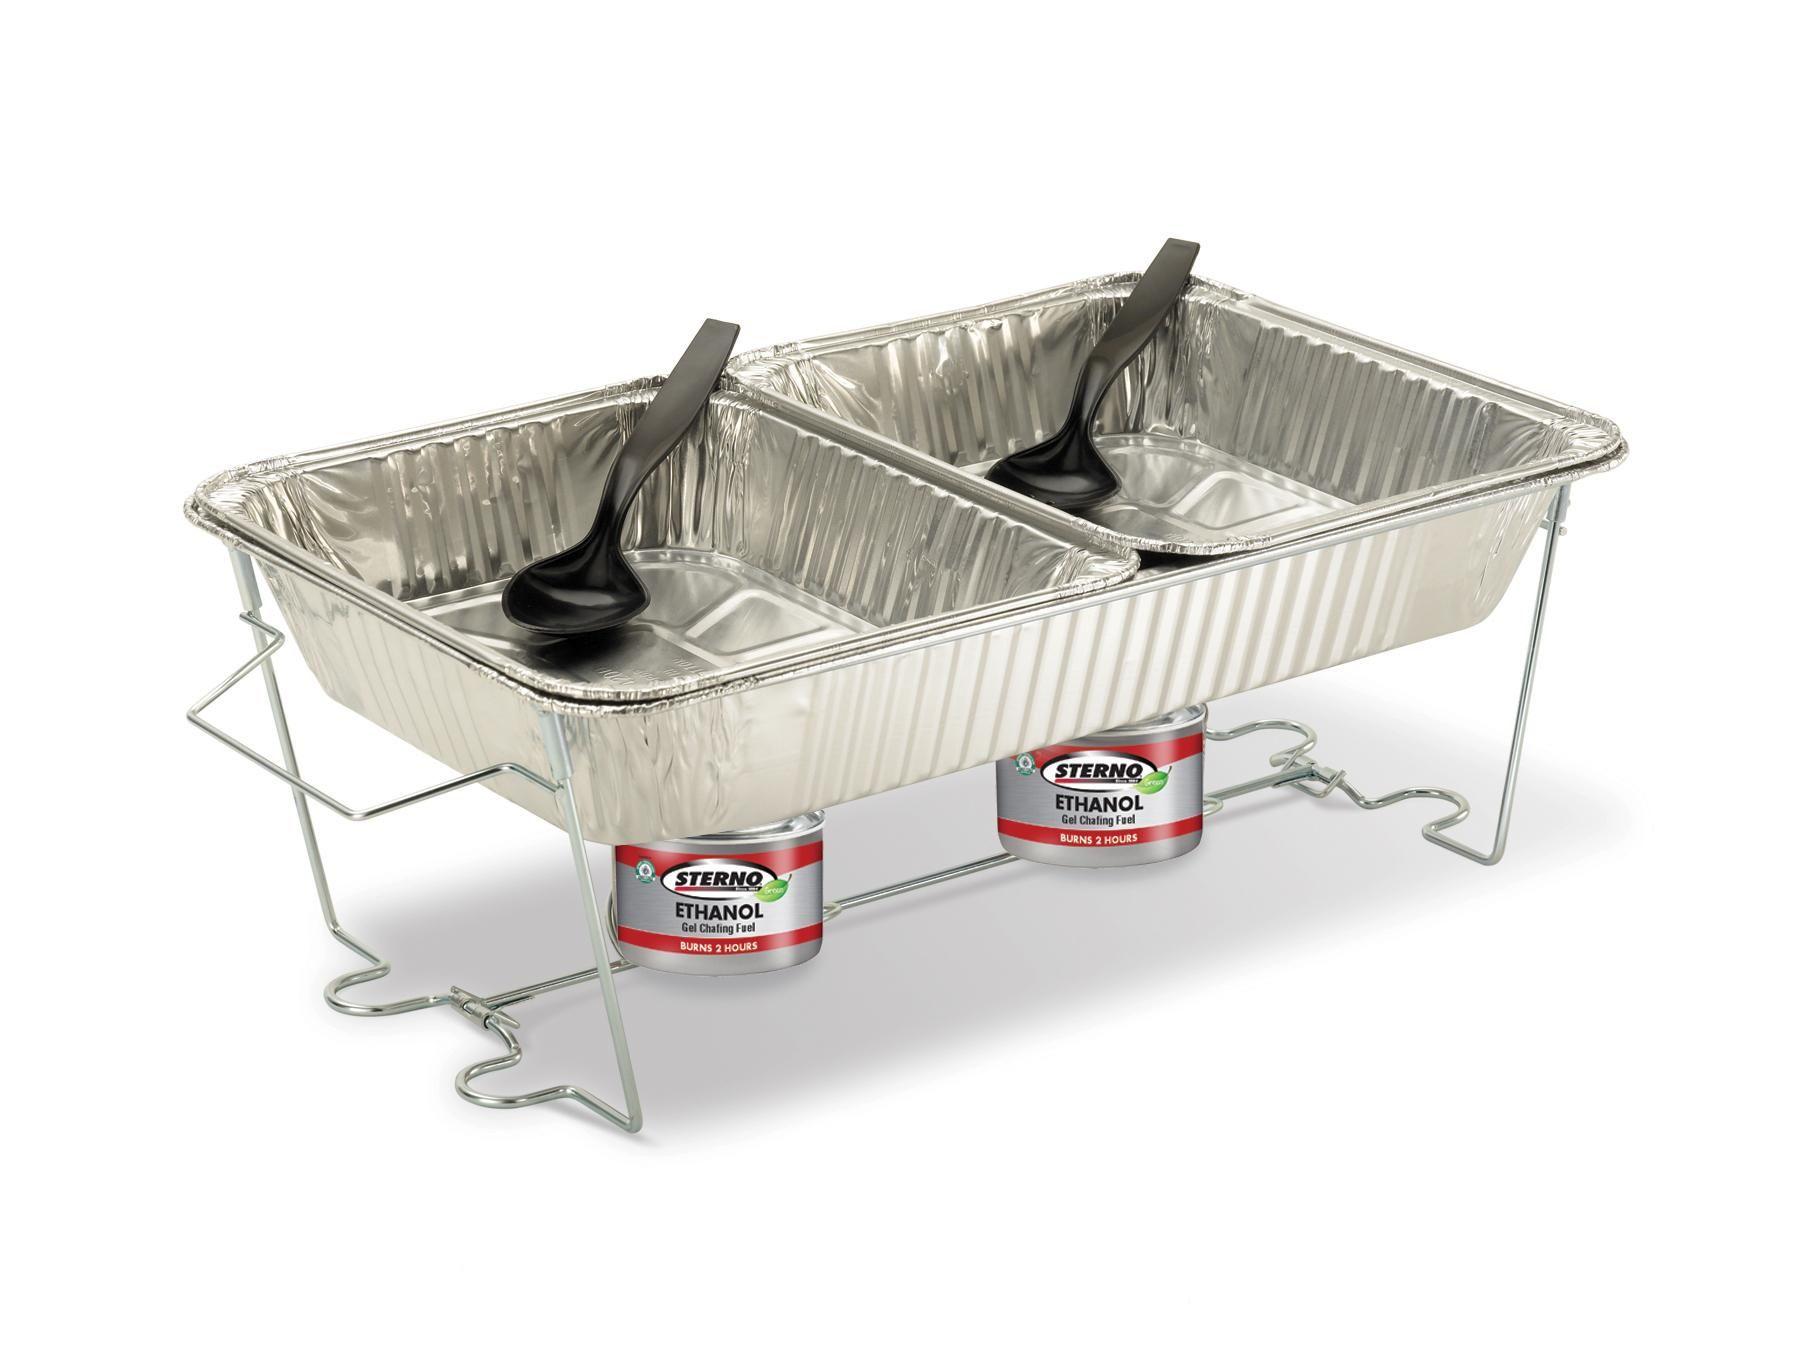 amazon com sterno pop up chafer set chafing dishes kitchen rh pinterest com sterno buffet servers sterno buffet servers